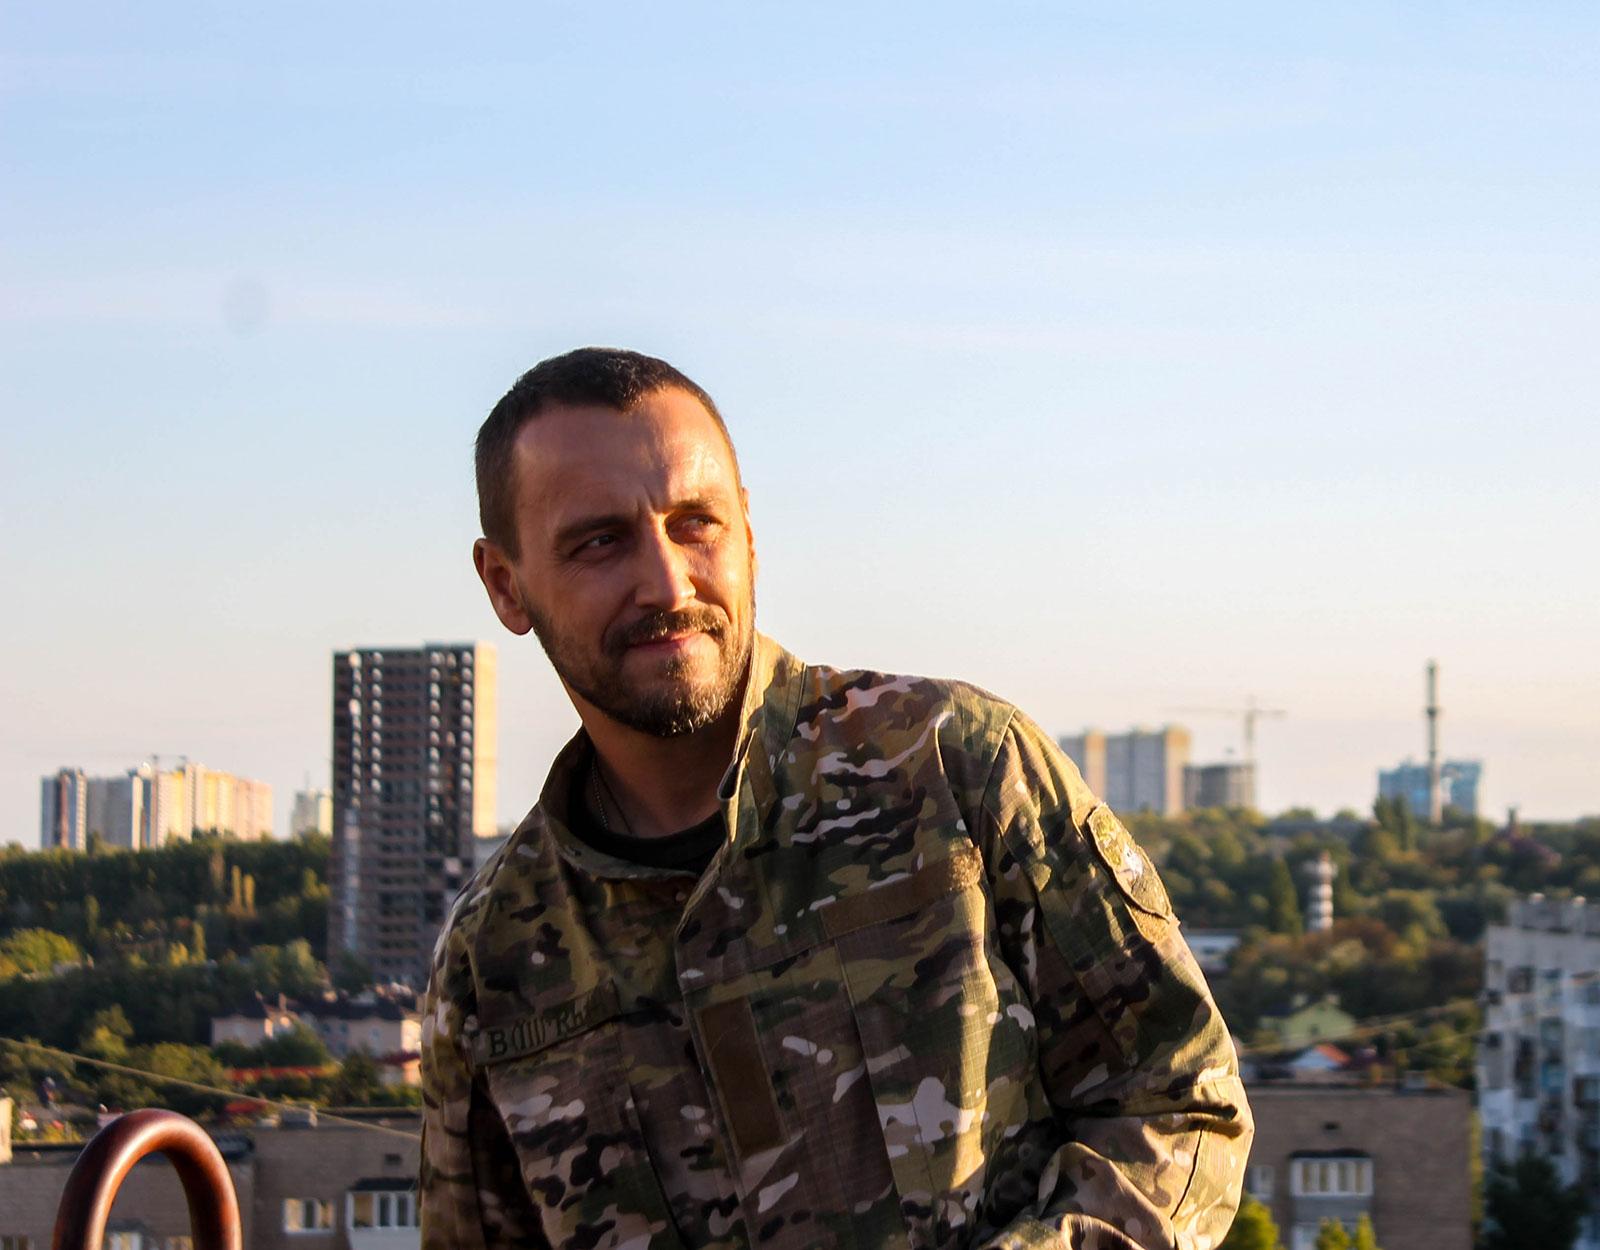 Головну роль в серіалі «Доброволець» зіграє актор ветеран АТО Олег Шульга